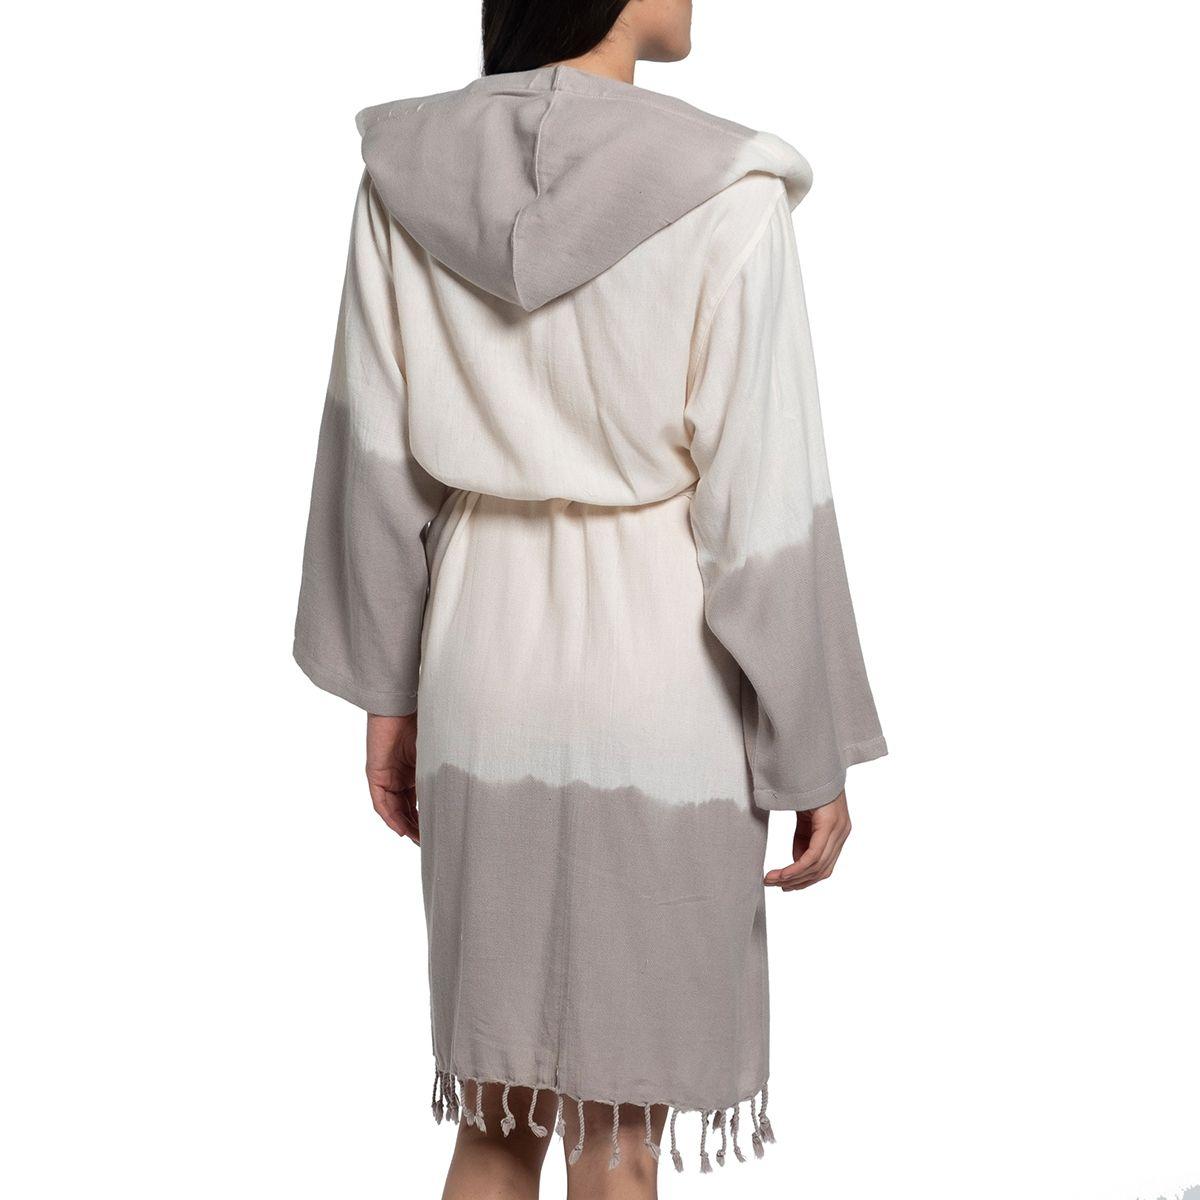 Bathrobe Tie Dye with hood - Taupe